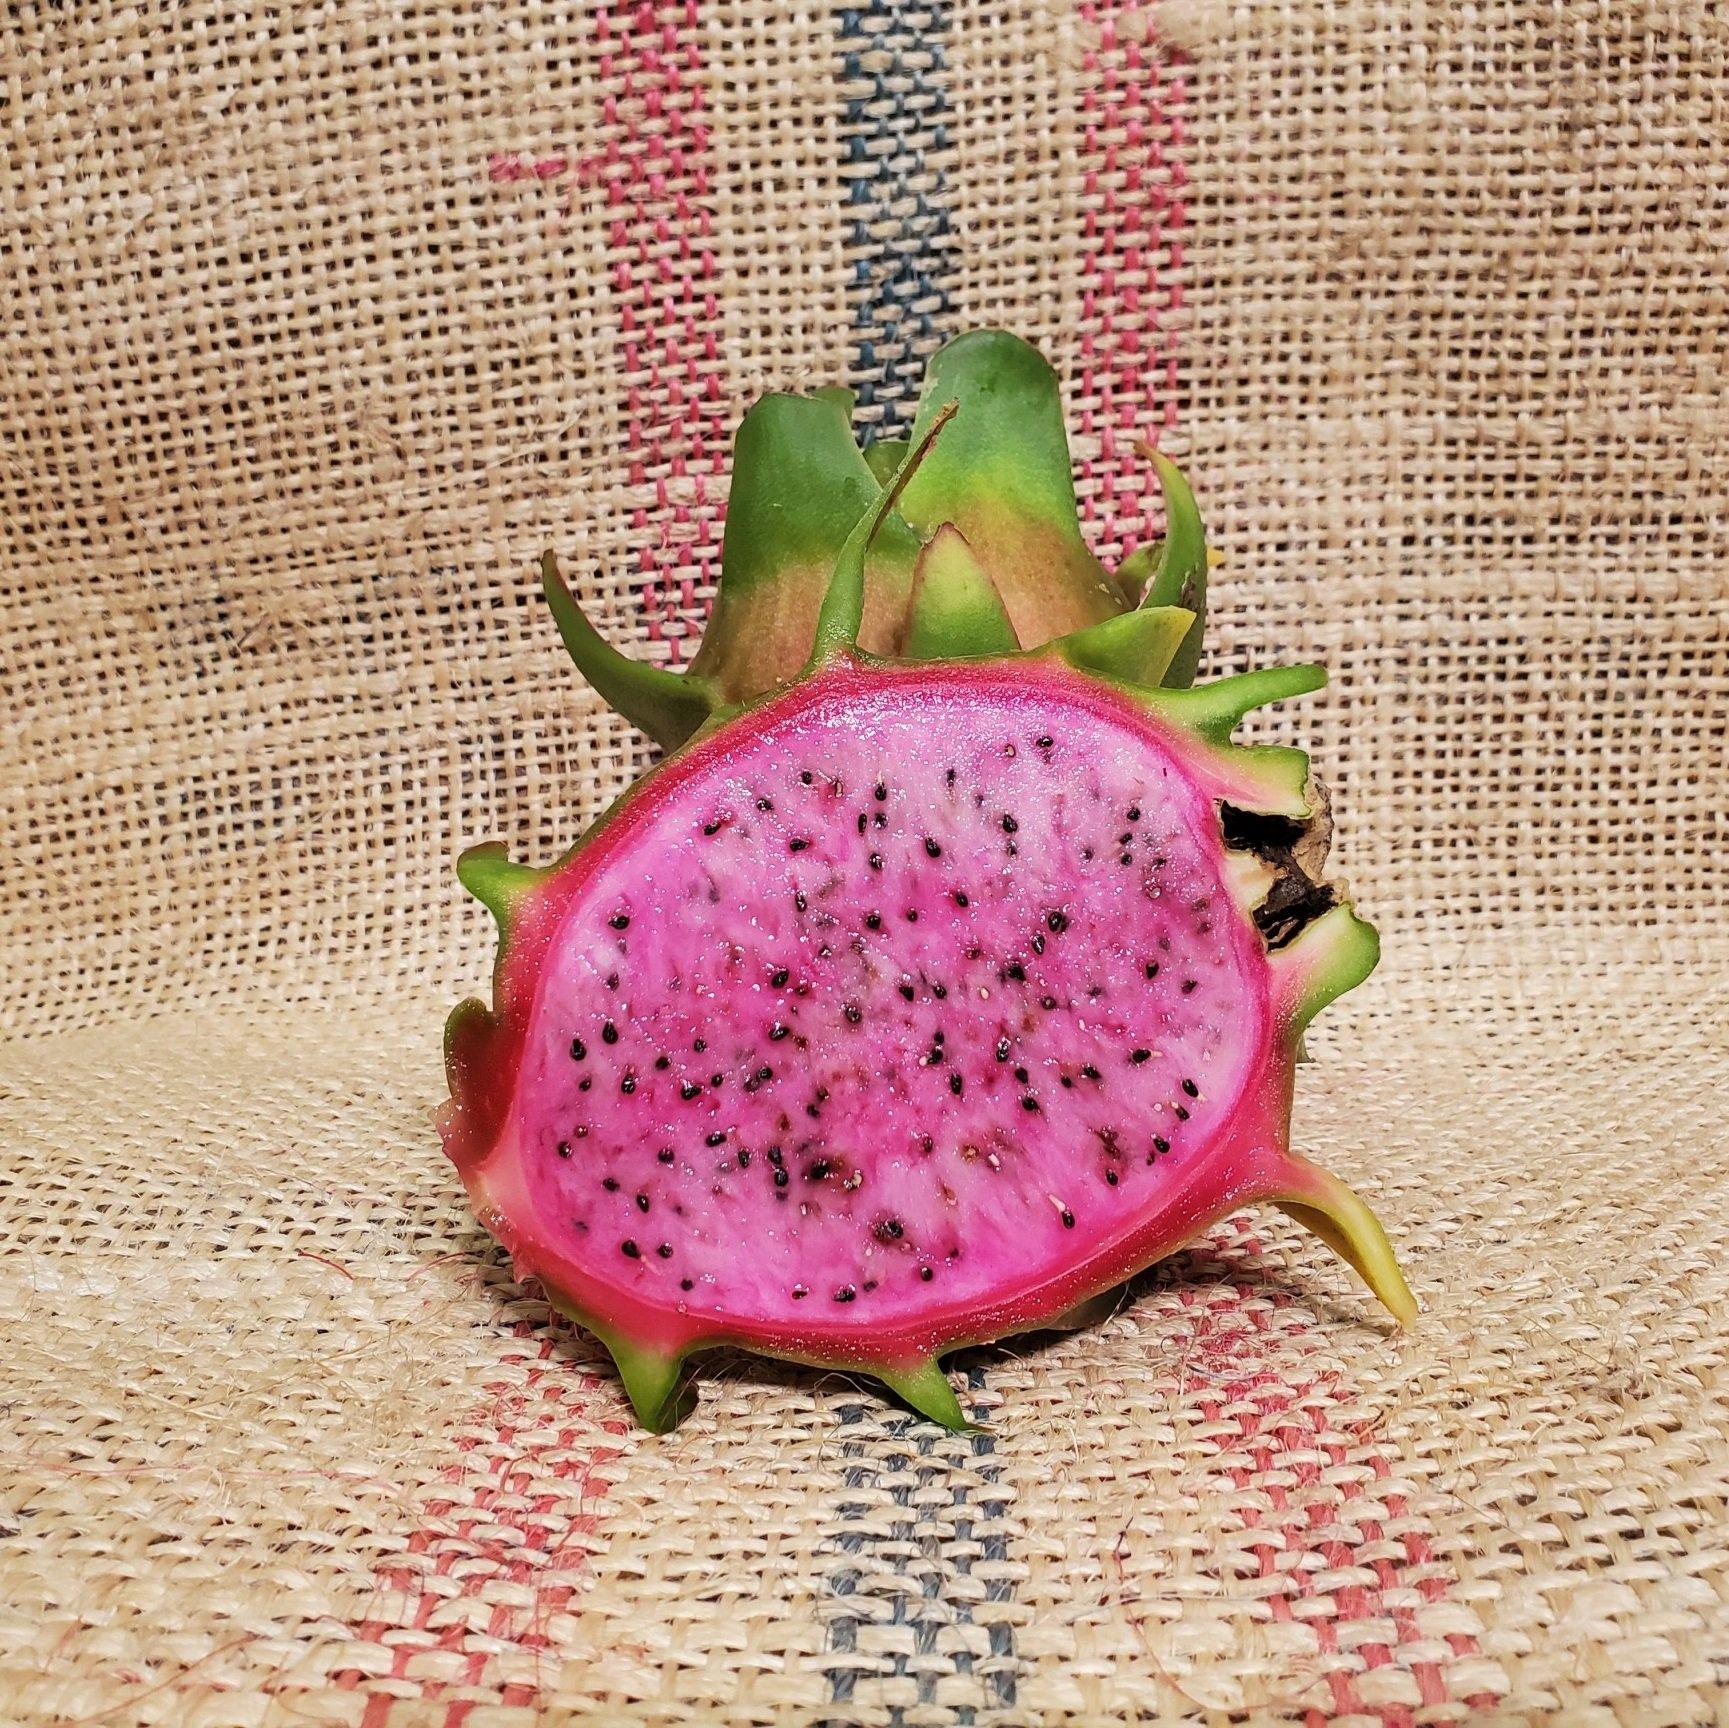 Asunta 4 Dragon Fruit Spicy Exotics